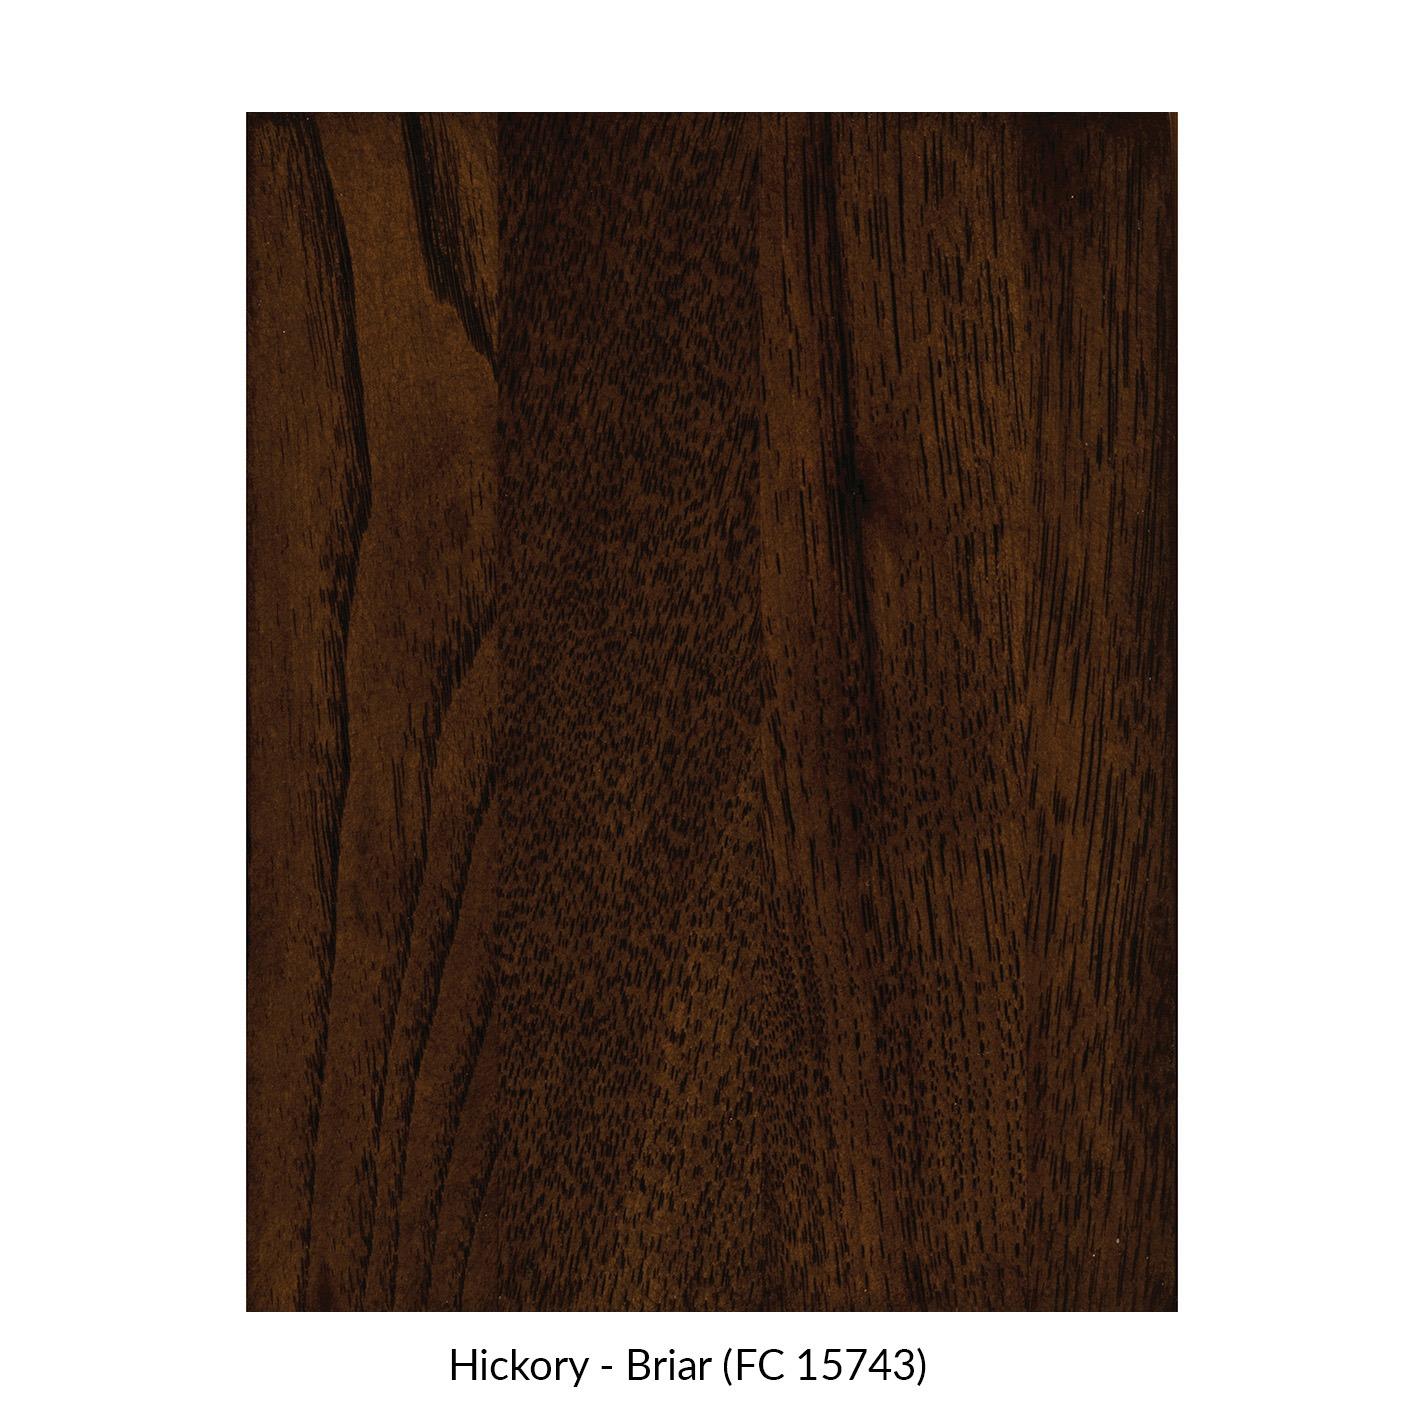 spectrum-hickory-briar-fc-15743.jpg